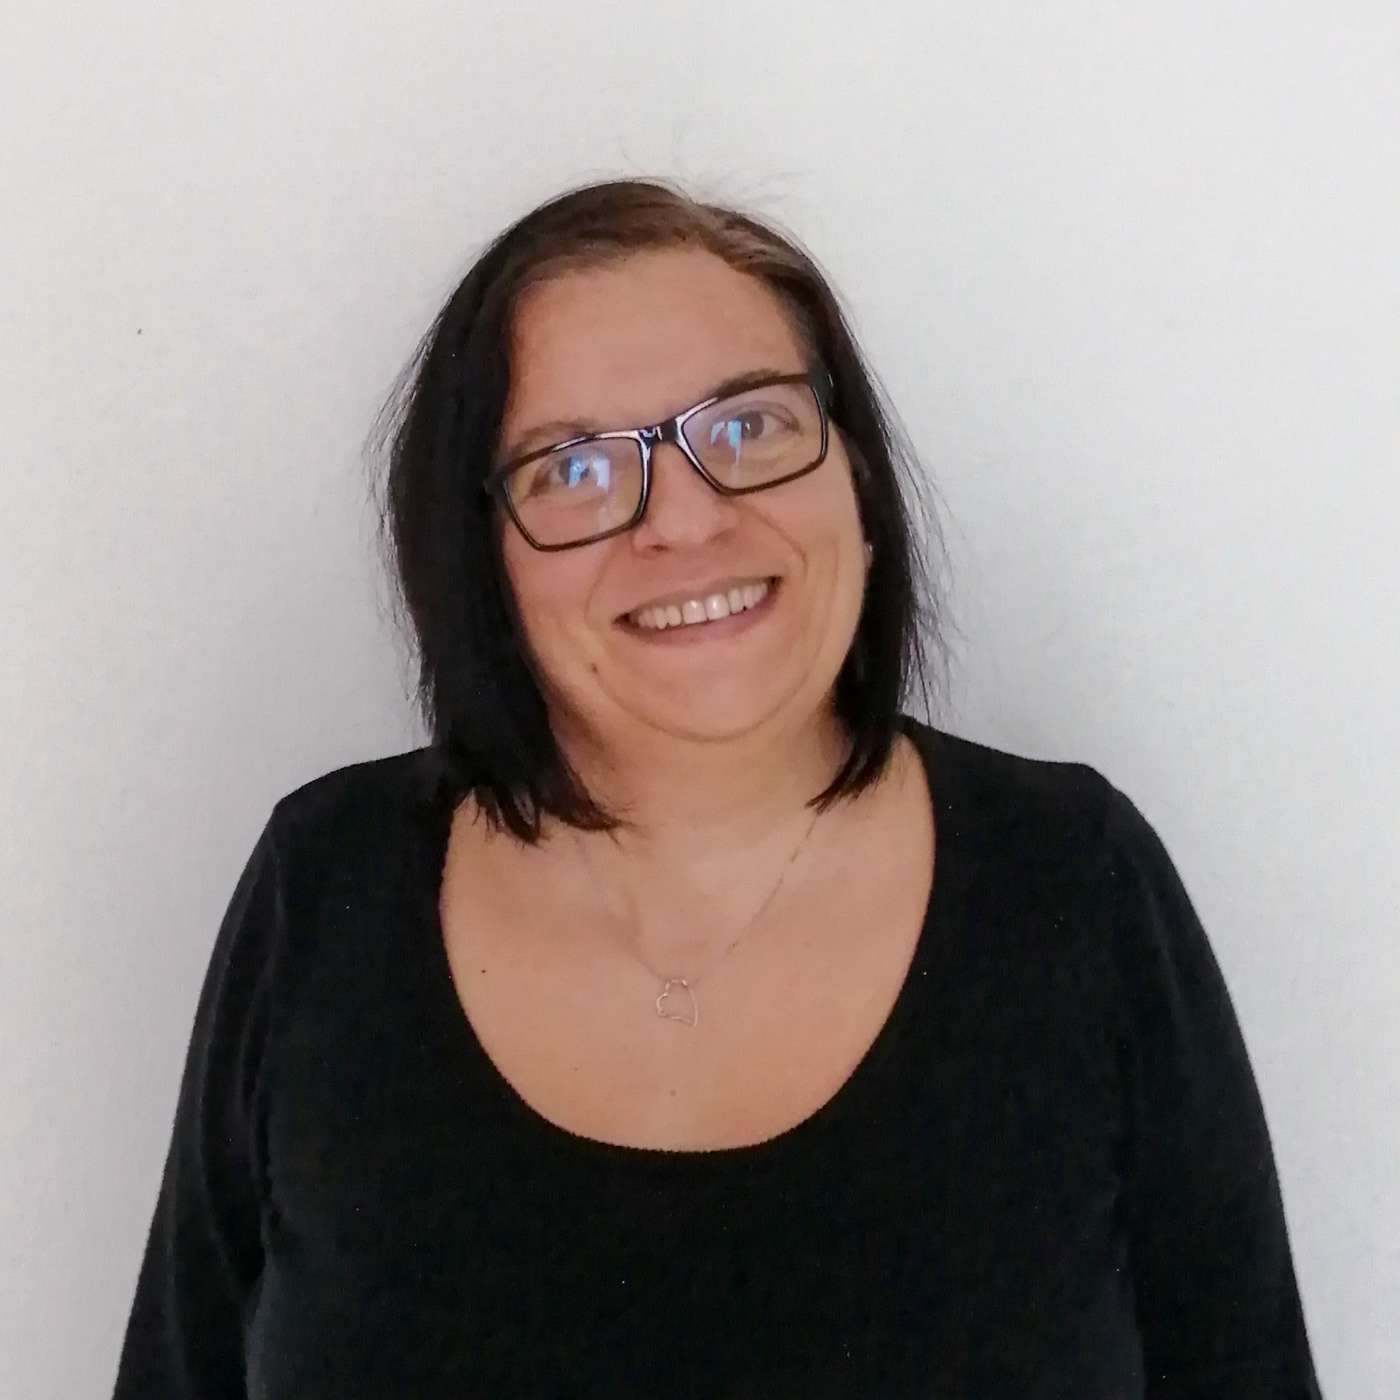 Cristina Benfenati